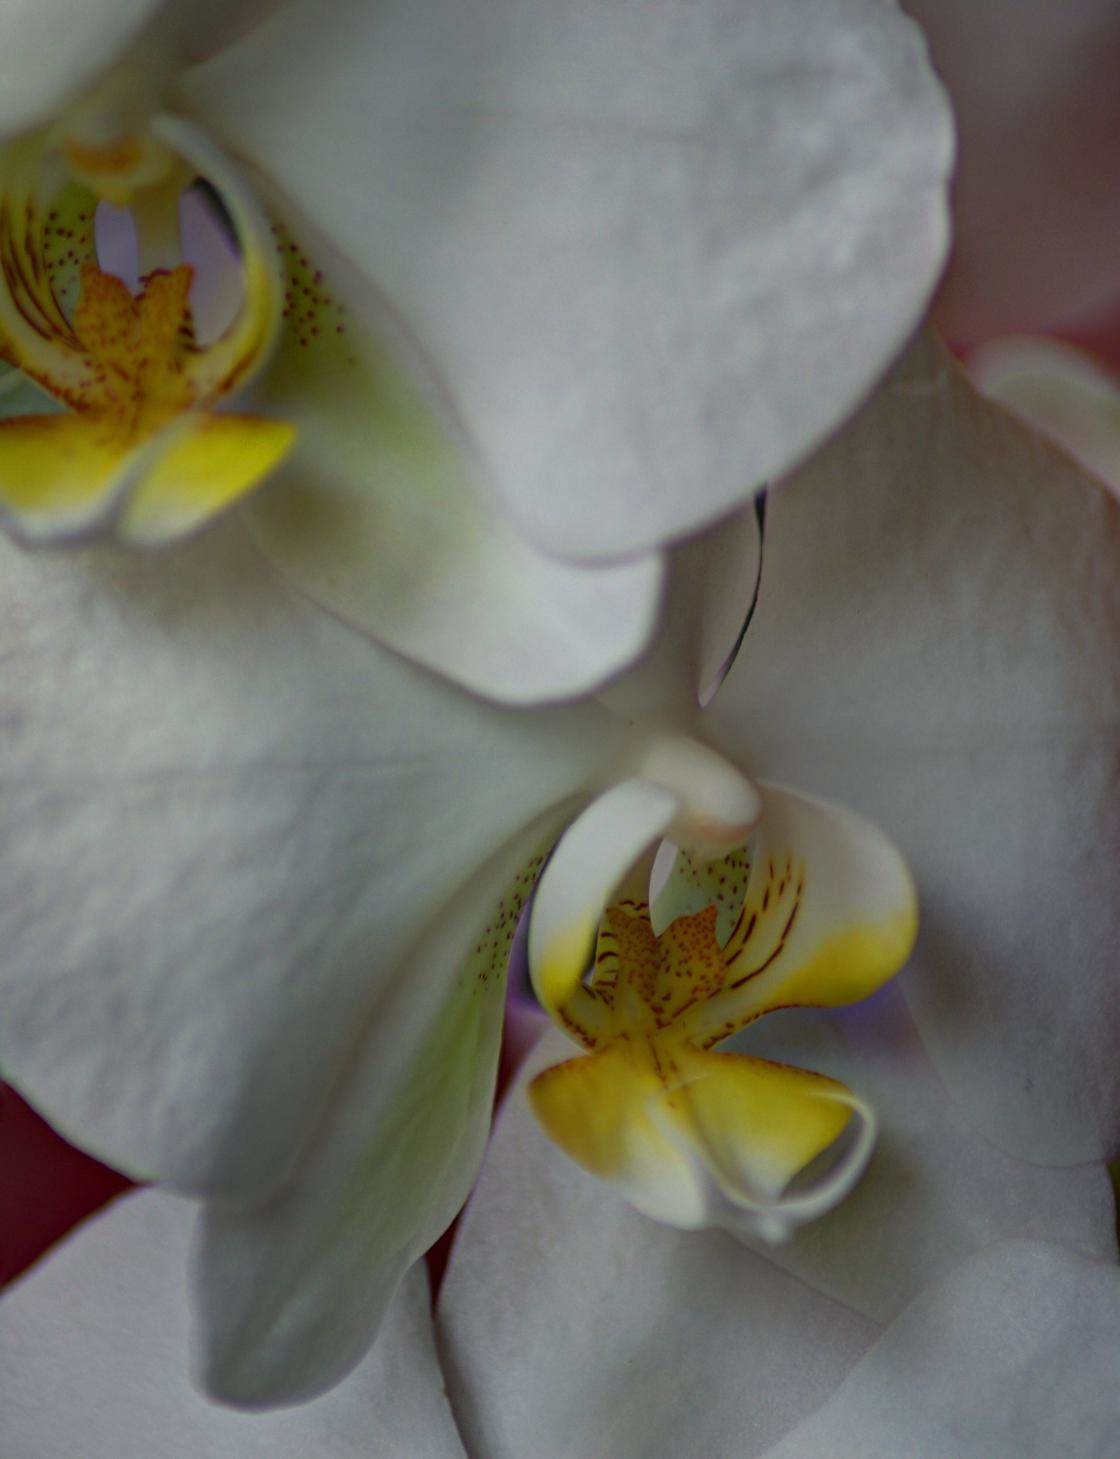 flowers iPhone photo contest-02 no script